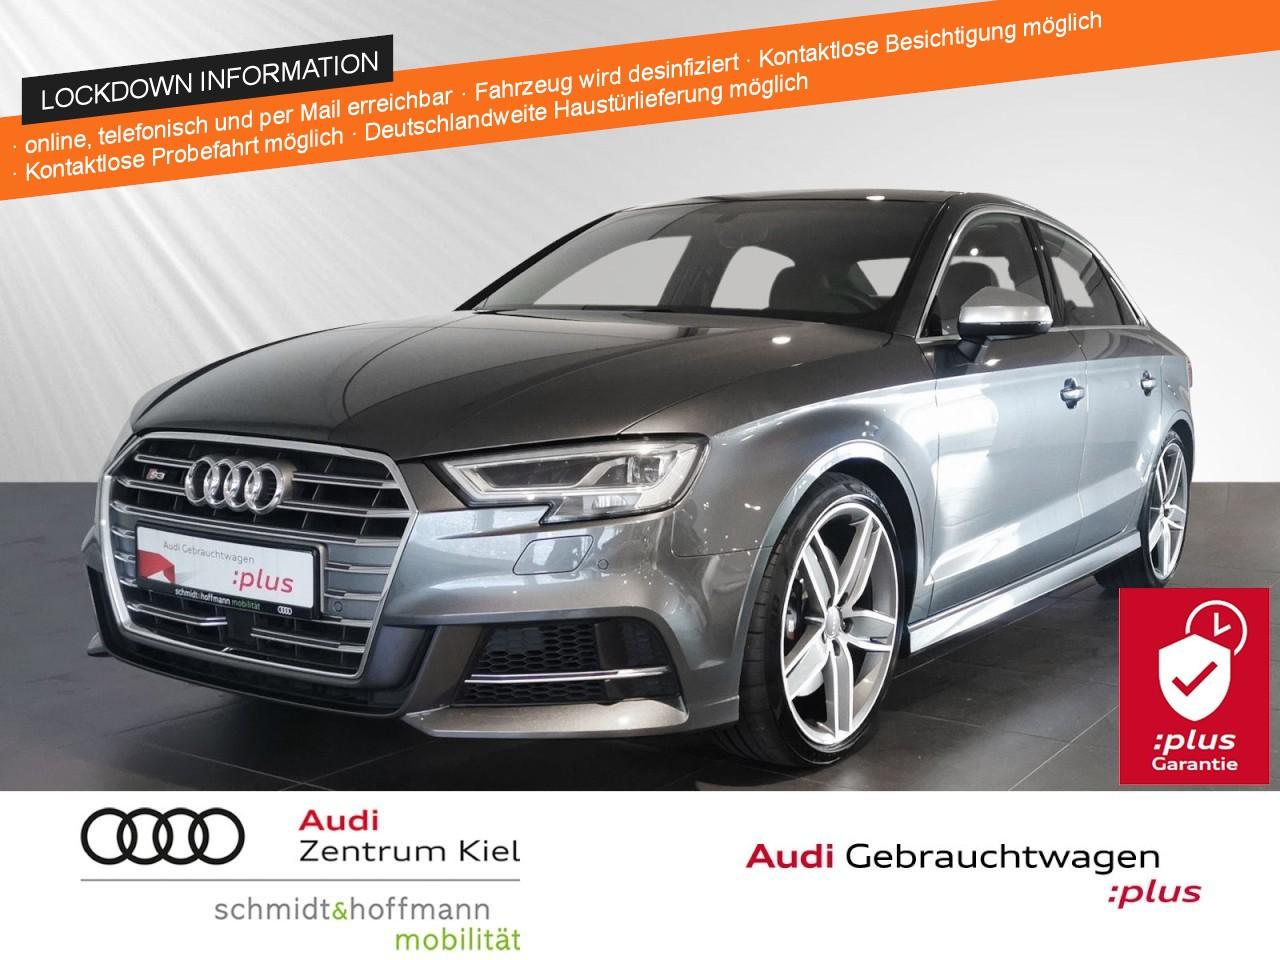 Audi S3 Limousine 2.0 TFSI Navi Panorama RFK ACC, Jahr 2018, Benzin